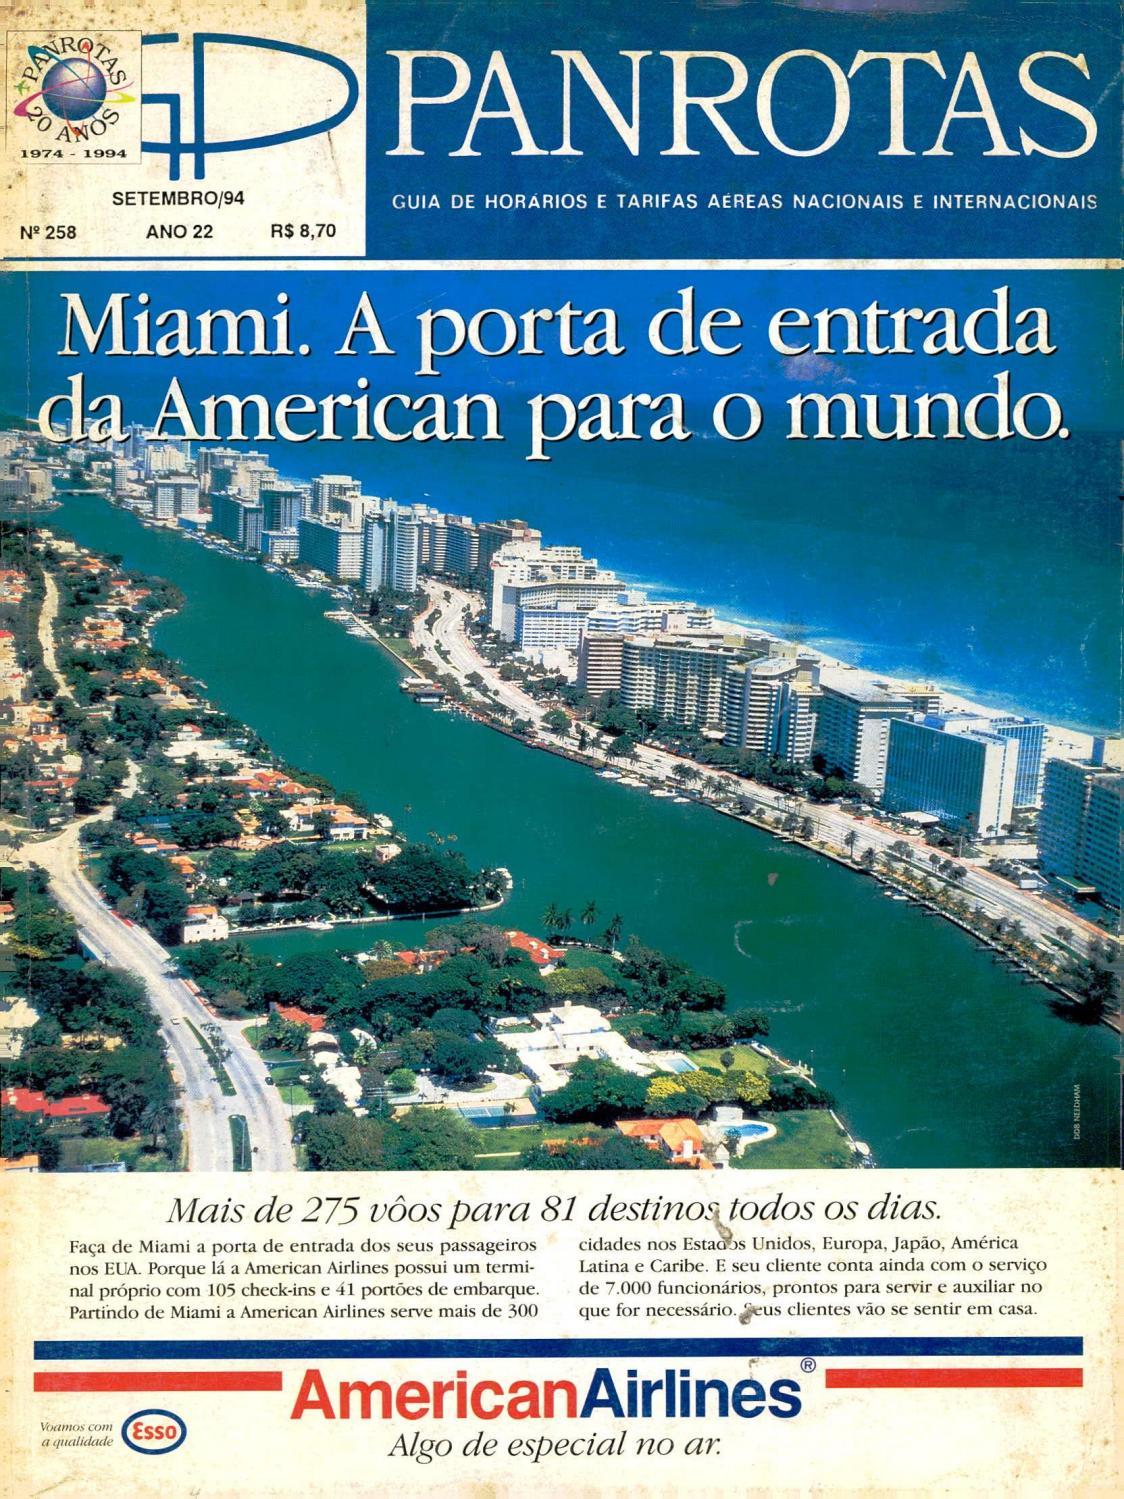 Guia PANROTAS - Edição 258 - Setembro 1994 by PANROTAS Editora - issuu 1aaf7f8c88c